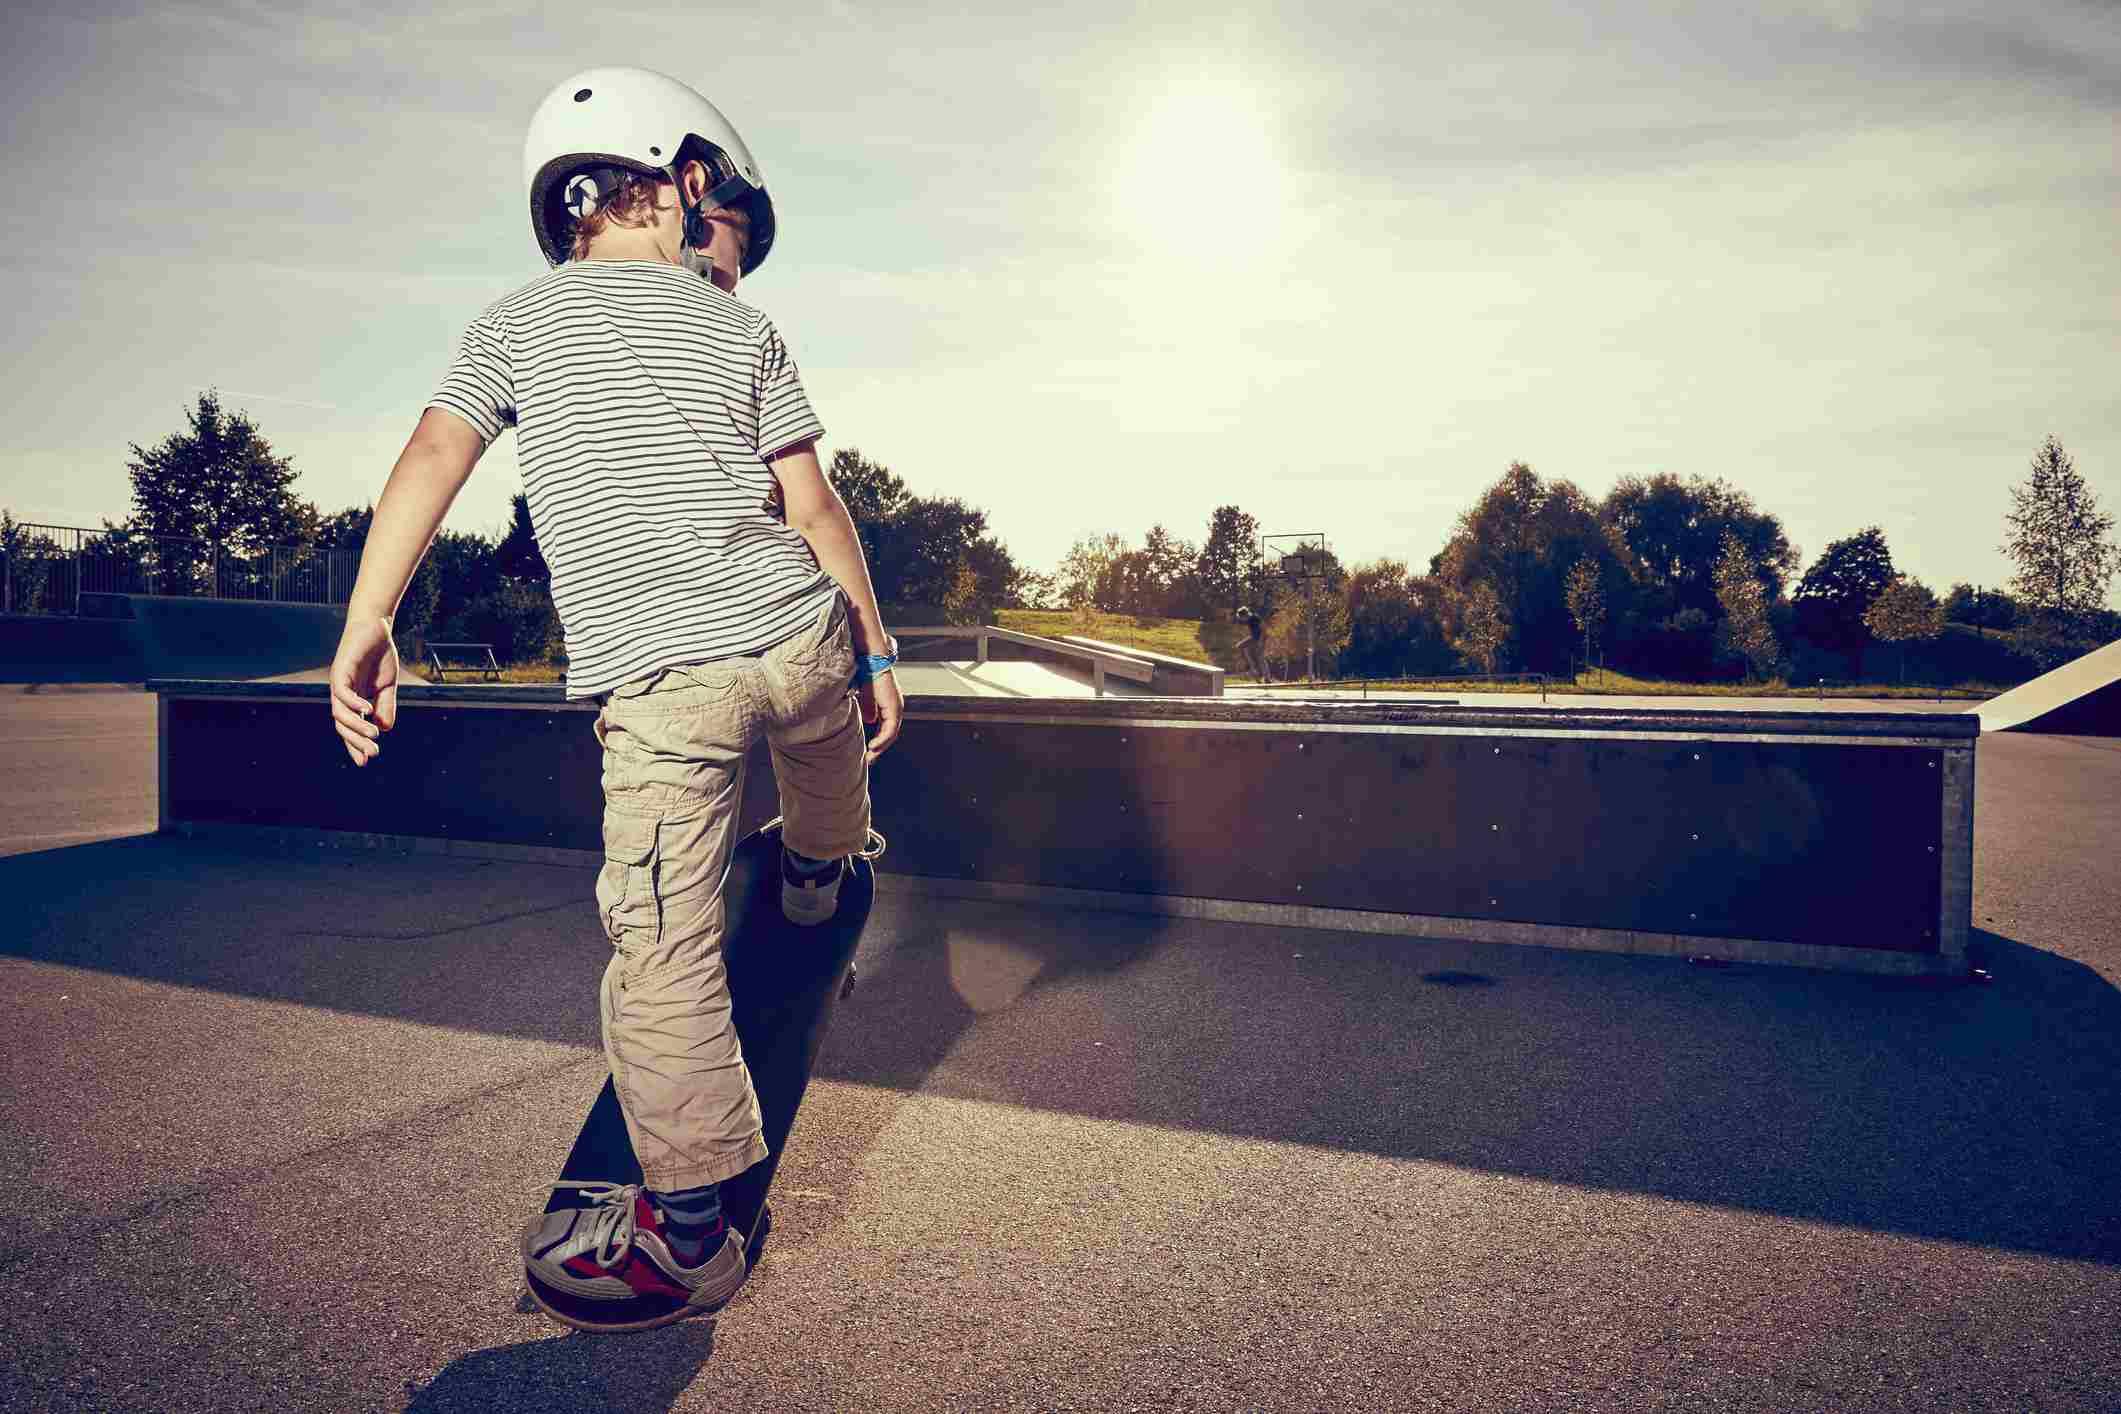 Boy skateboarding in park